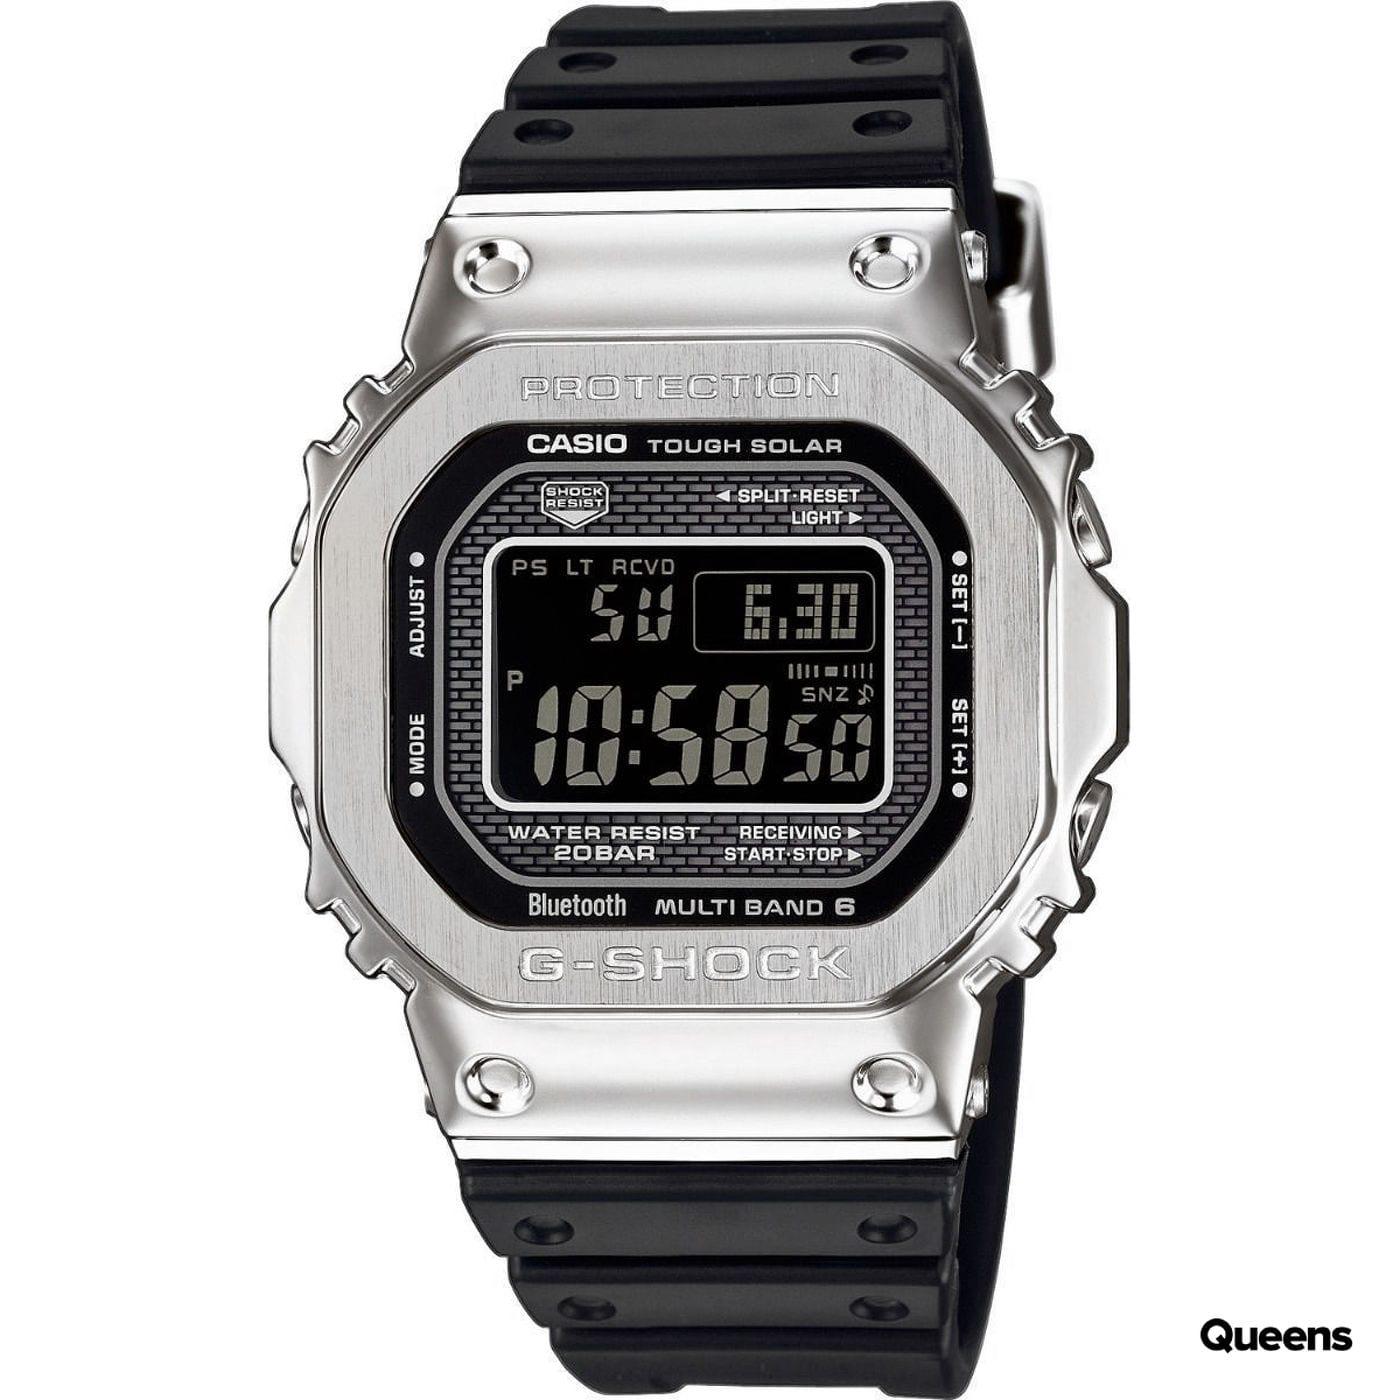 Casio G-Shock GMW-B5000-1ER strieborné